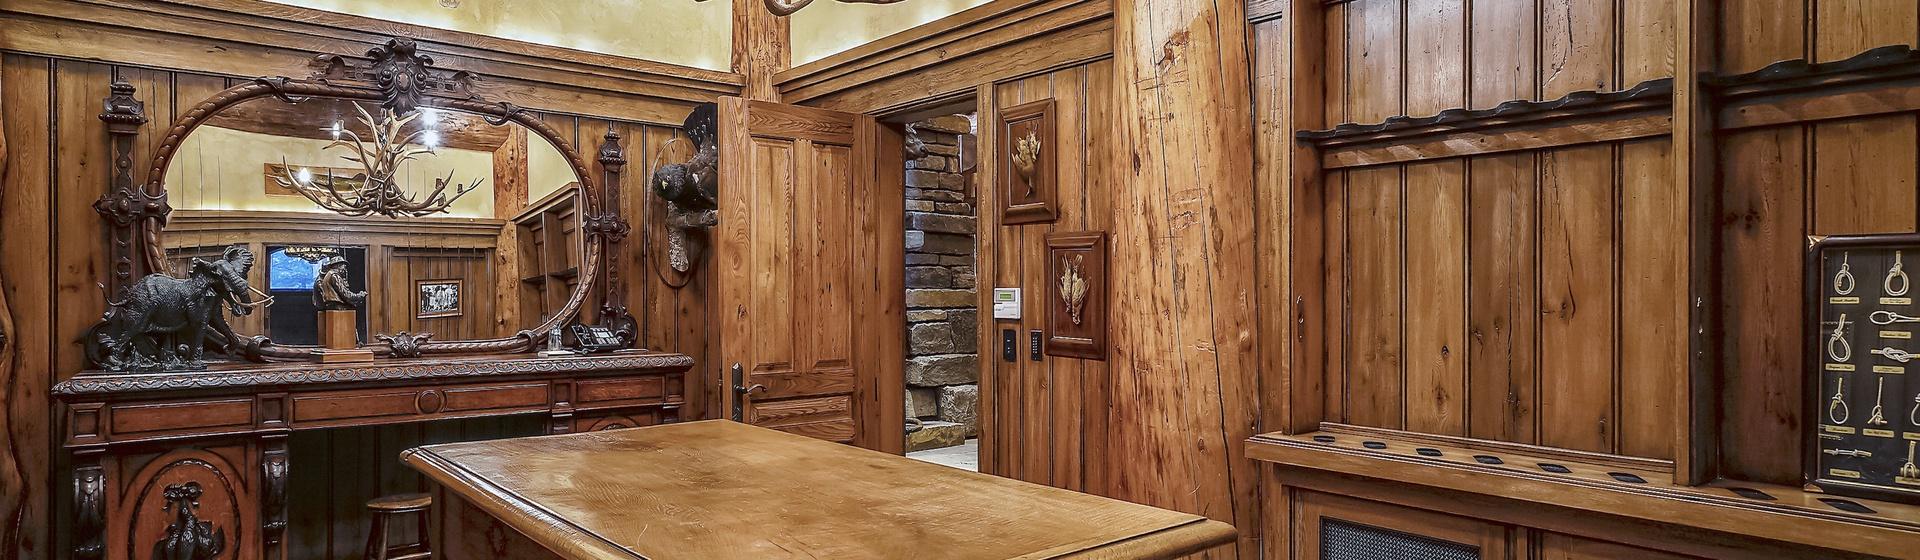 3.4-Telluride-Sleeping-Indian-Ranch-gun-room-2-web.JPG